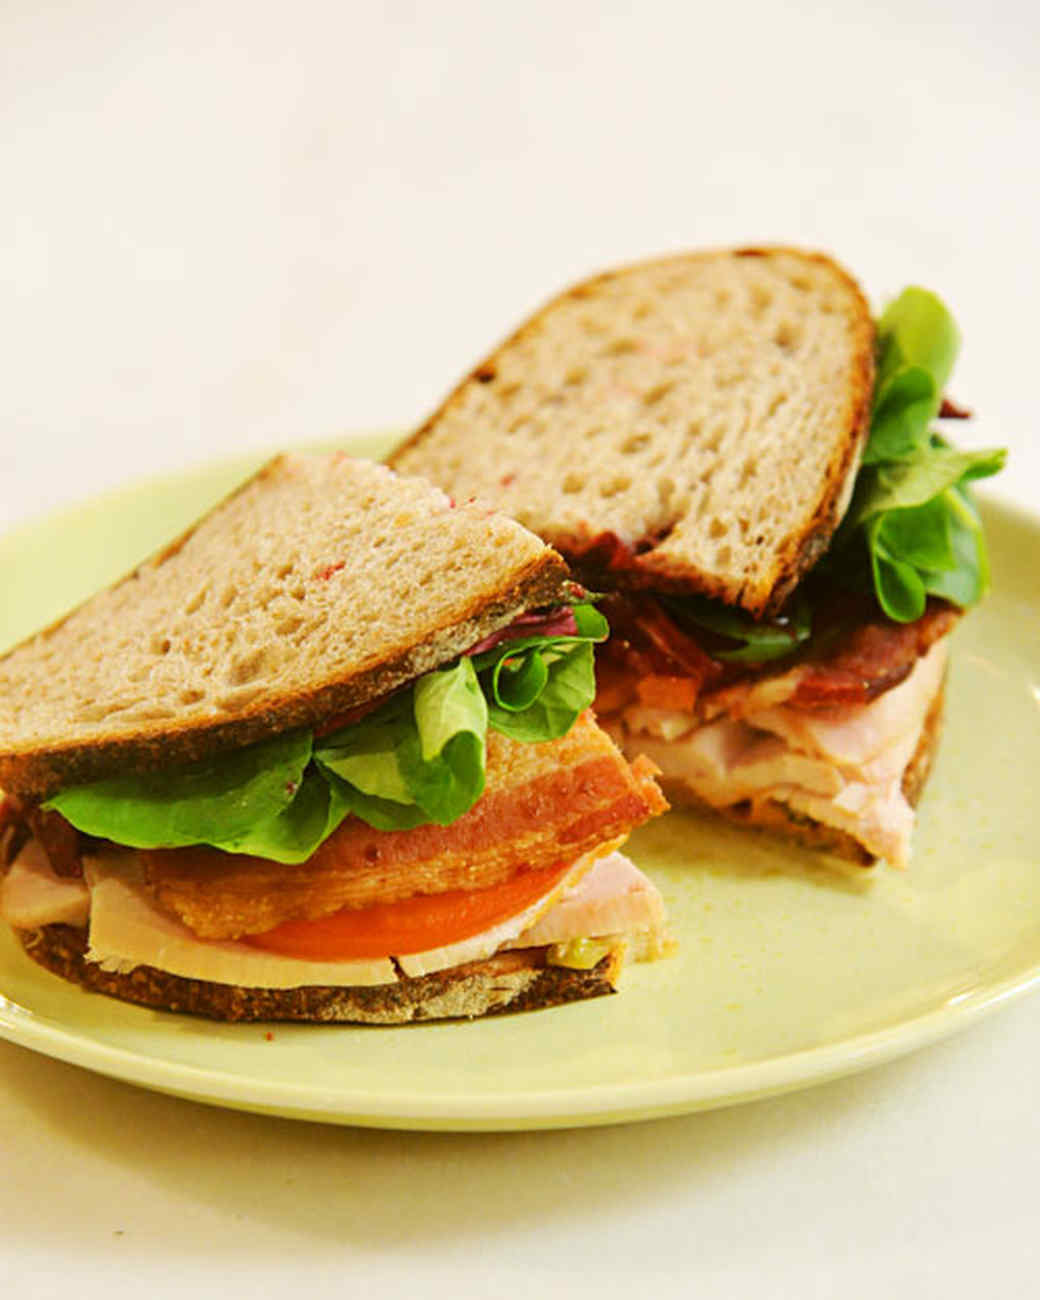 Martha's Turkey Sandwich